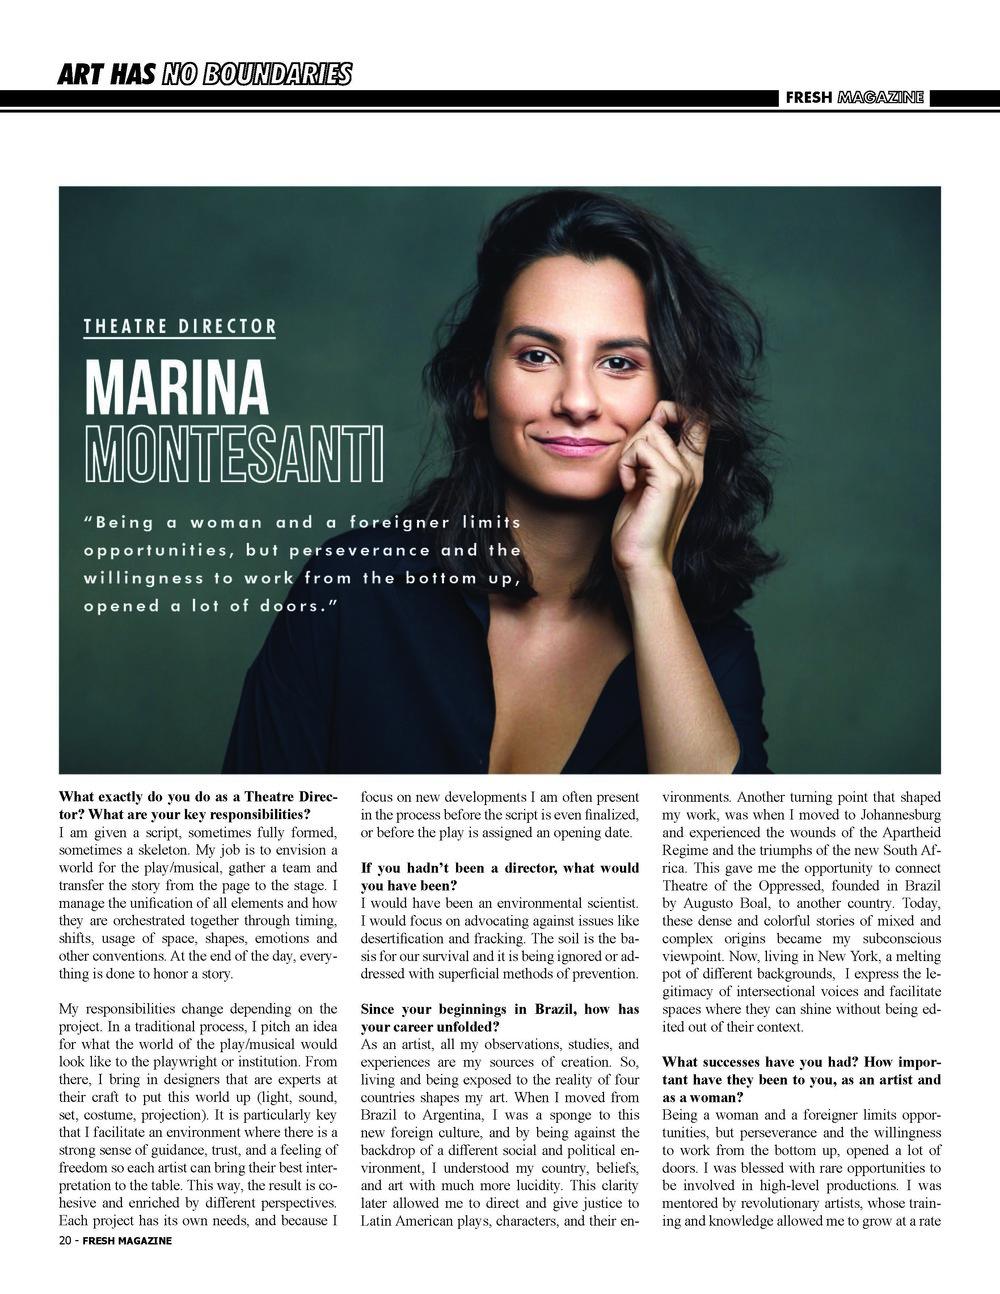 Marina Montesanti PDF_Page_1.jpg